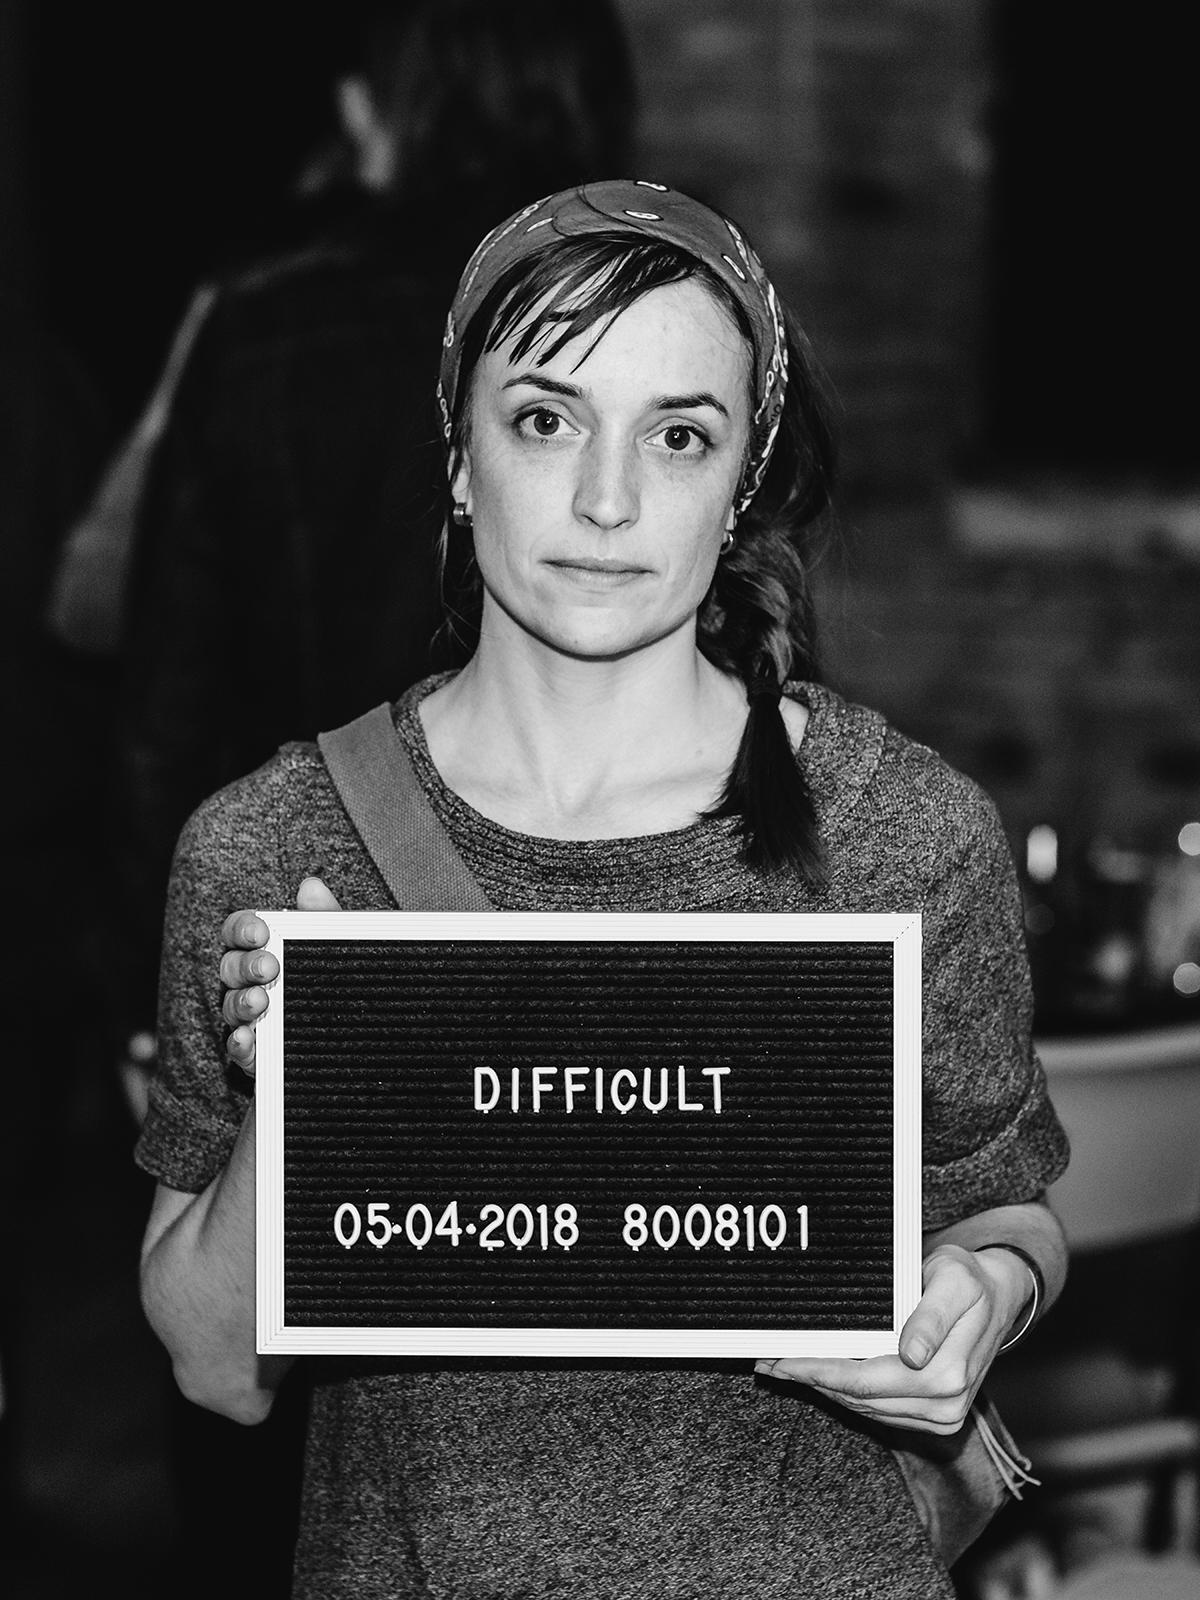 8008101 difficult.jpg